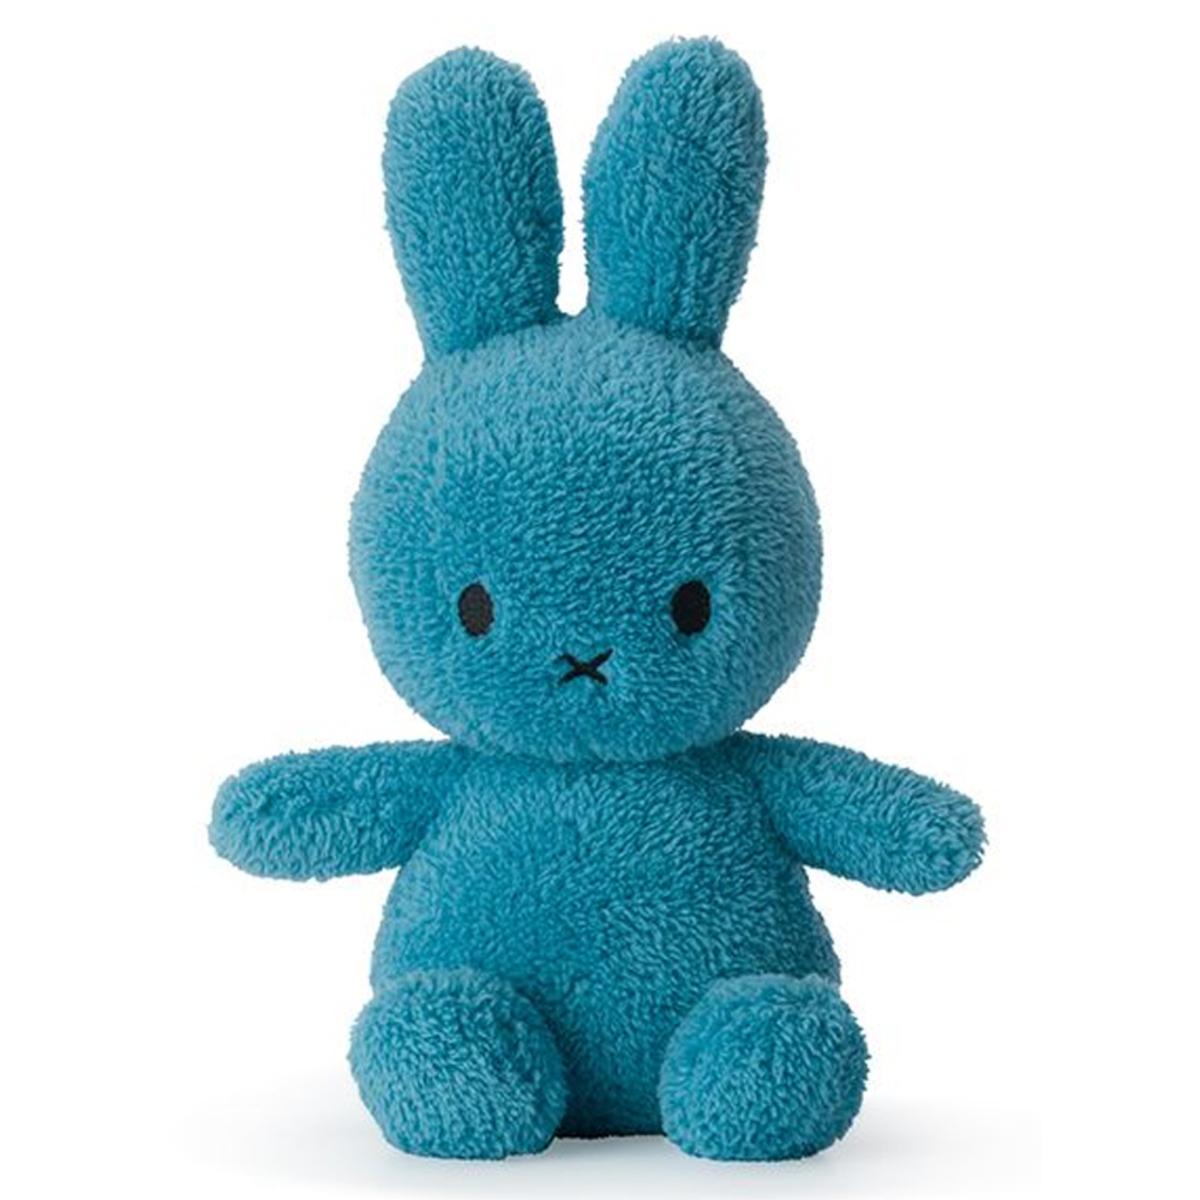 Peluche Lapin Miffy Extra Doux Bleu Océan - Moyen Peluche Lapin Extra Doux Bleu Océan 23 cm